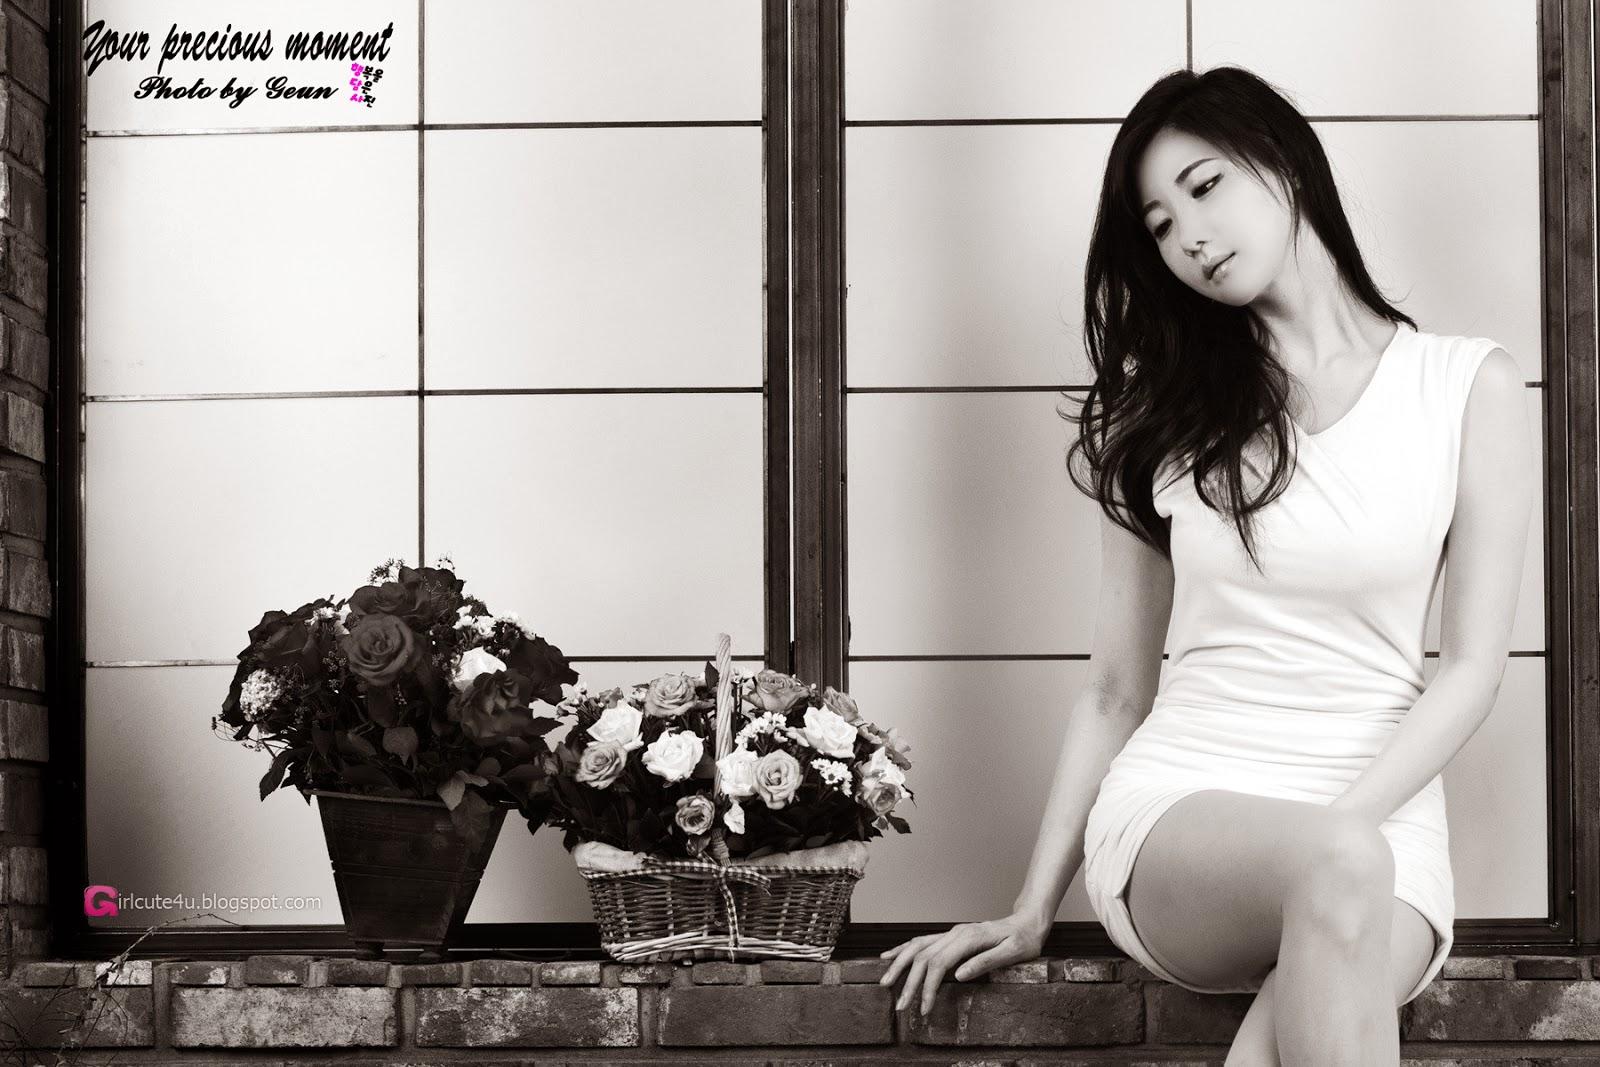 5 Yeon Da Bin- Three new studio sets - very cute asian girl - girlcute4u.blogspot.com